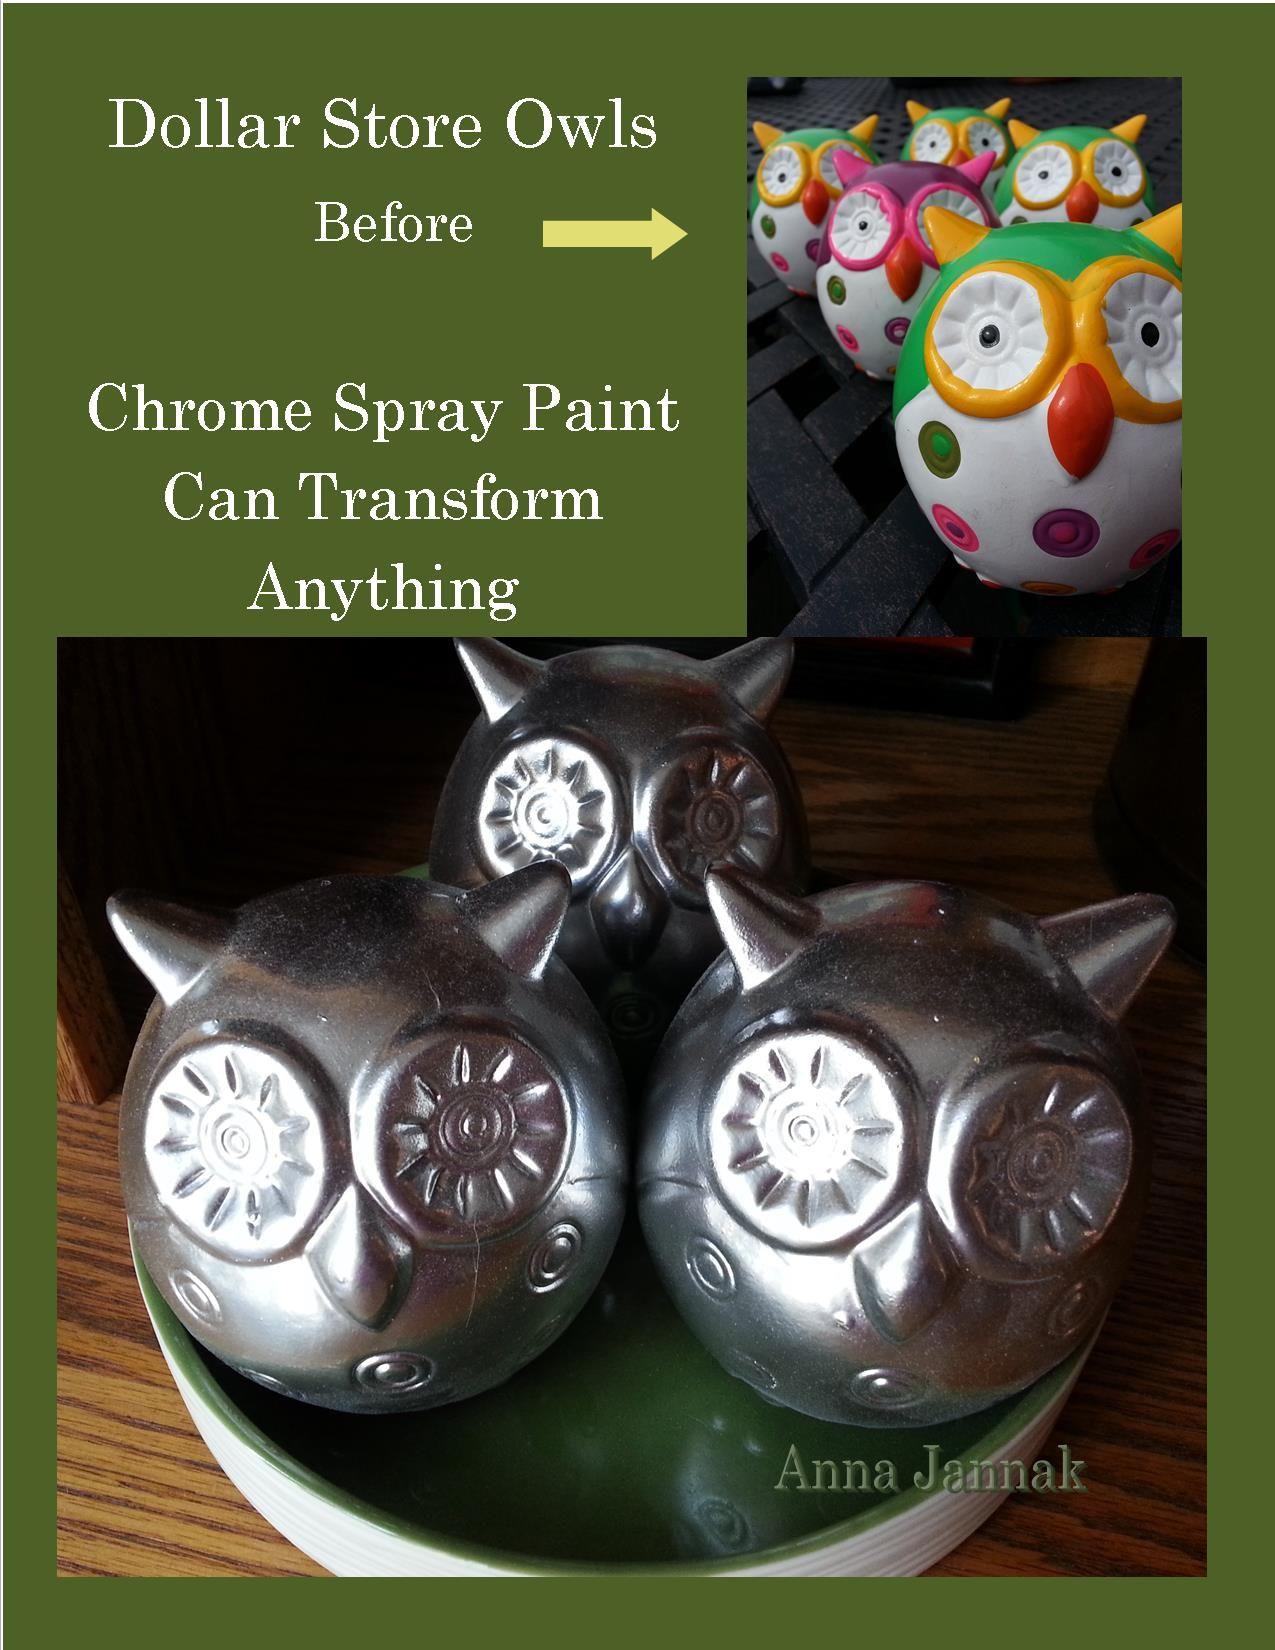 Pin by Missy Beechy on DIY | Dollar stores, Chrome spray ...